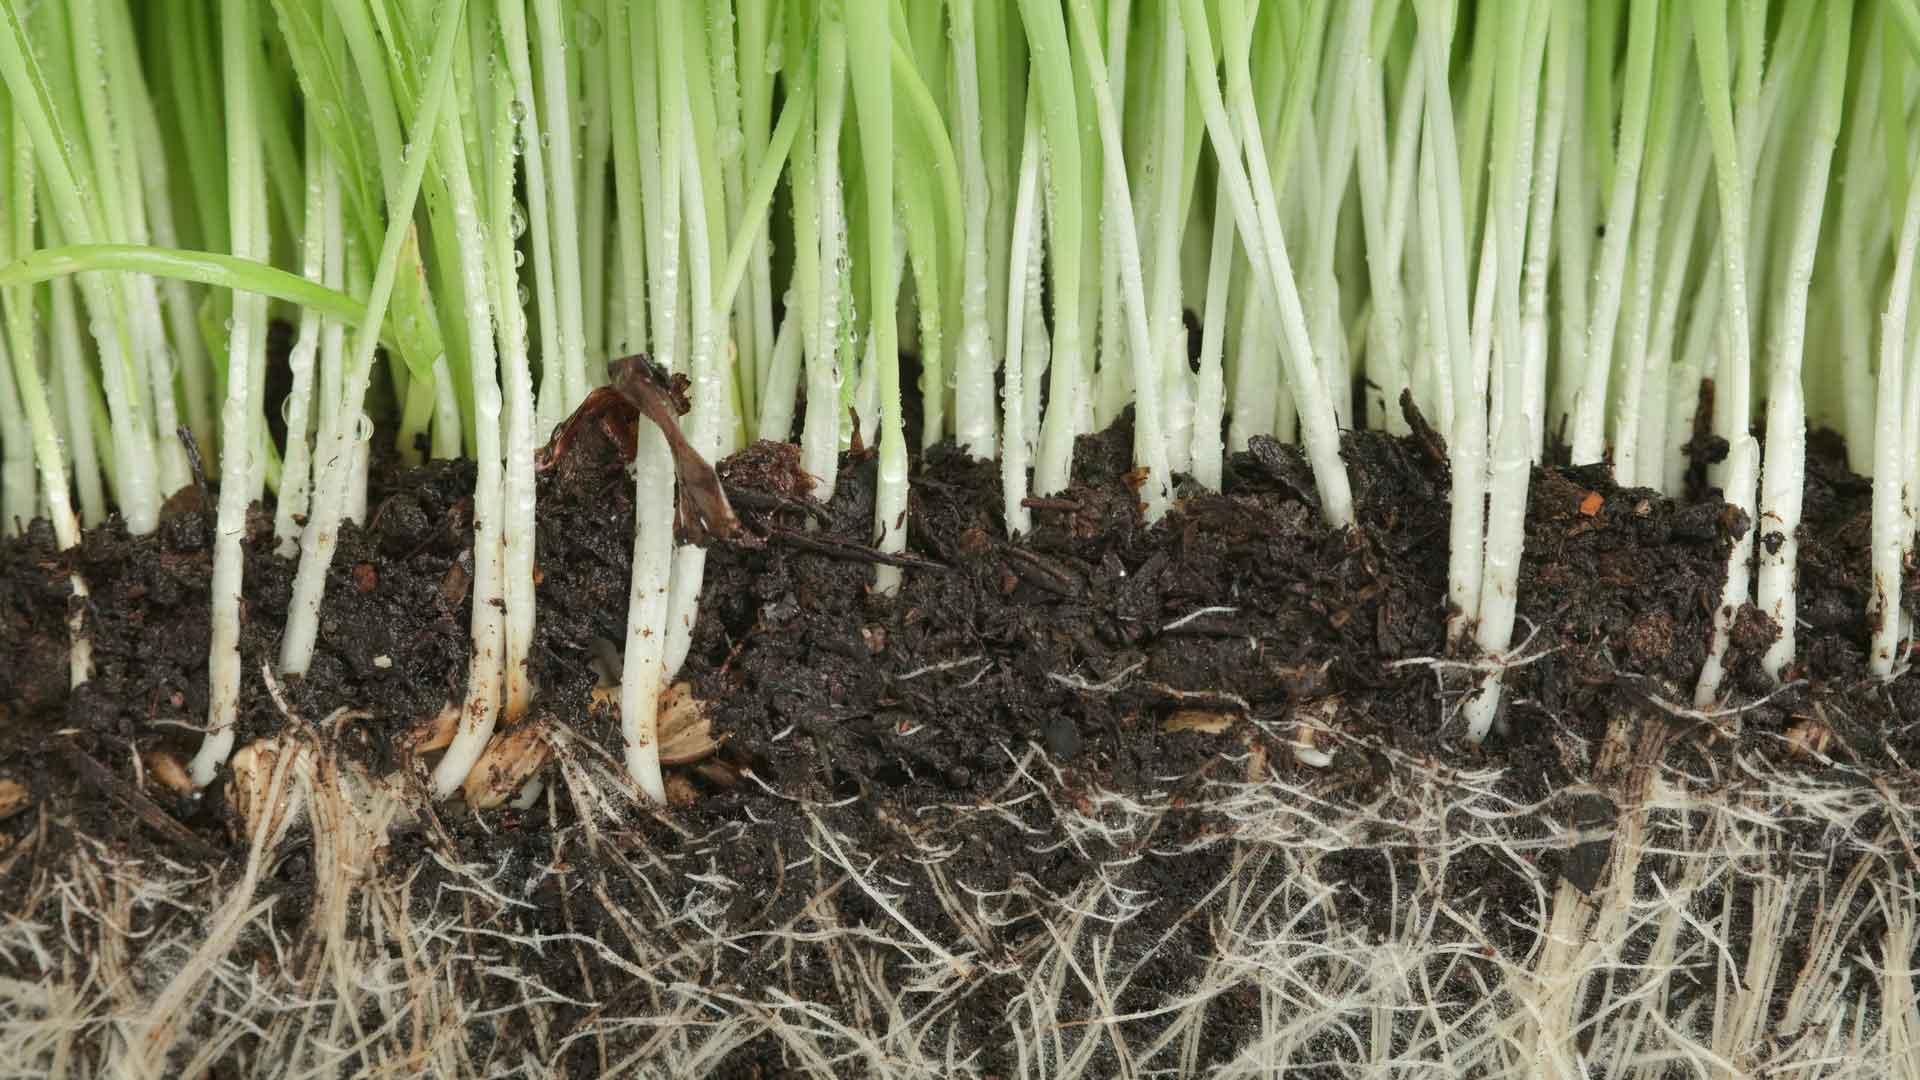 Auburn-Sky-Landscaping-Core-Aeration-Grass-Root-System.jpg